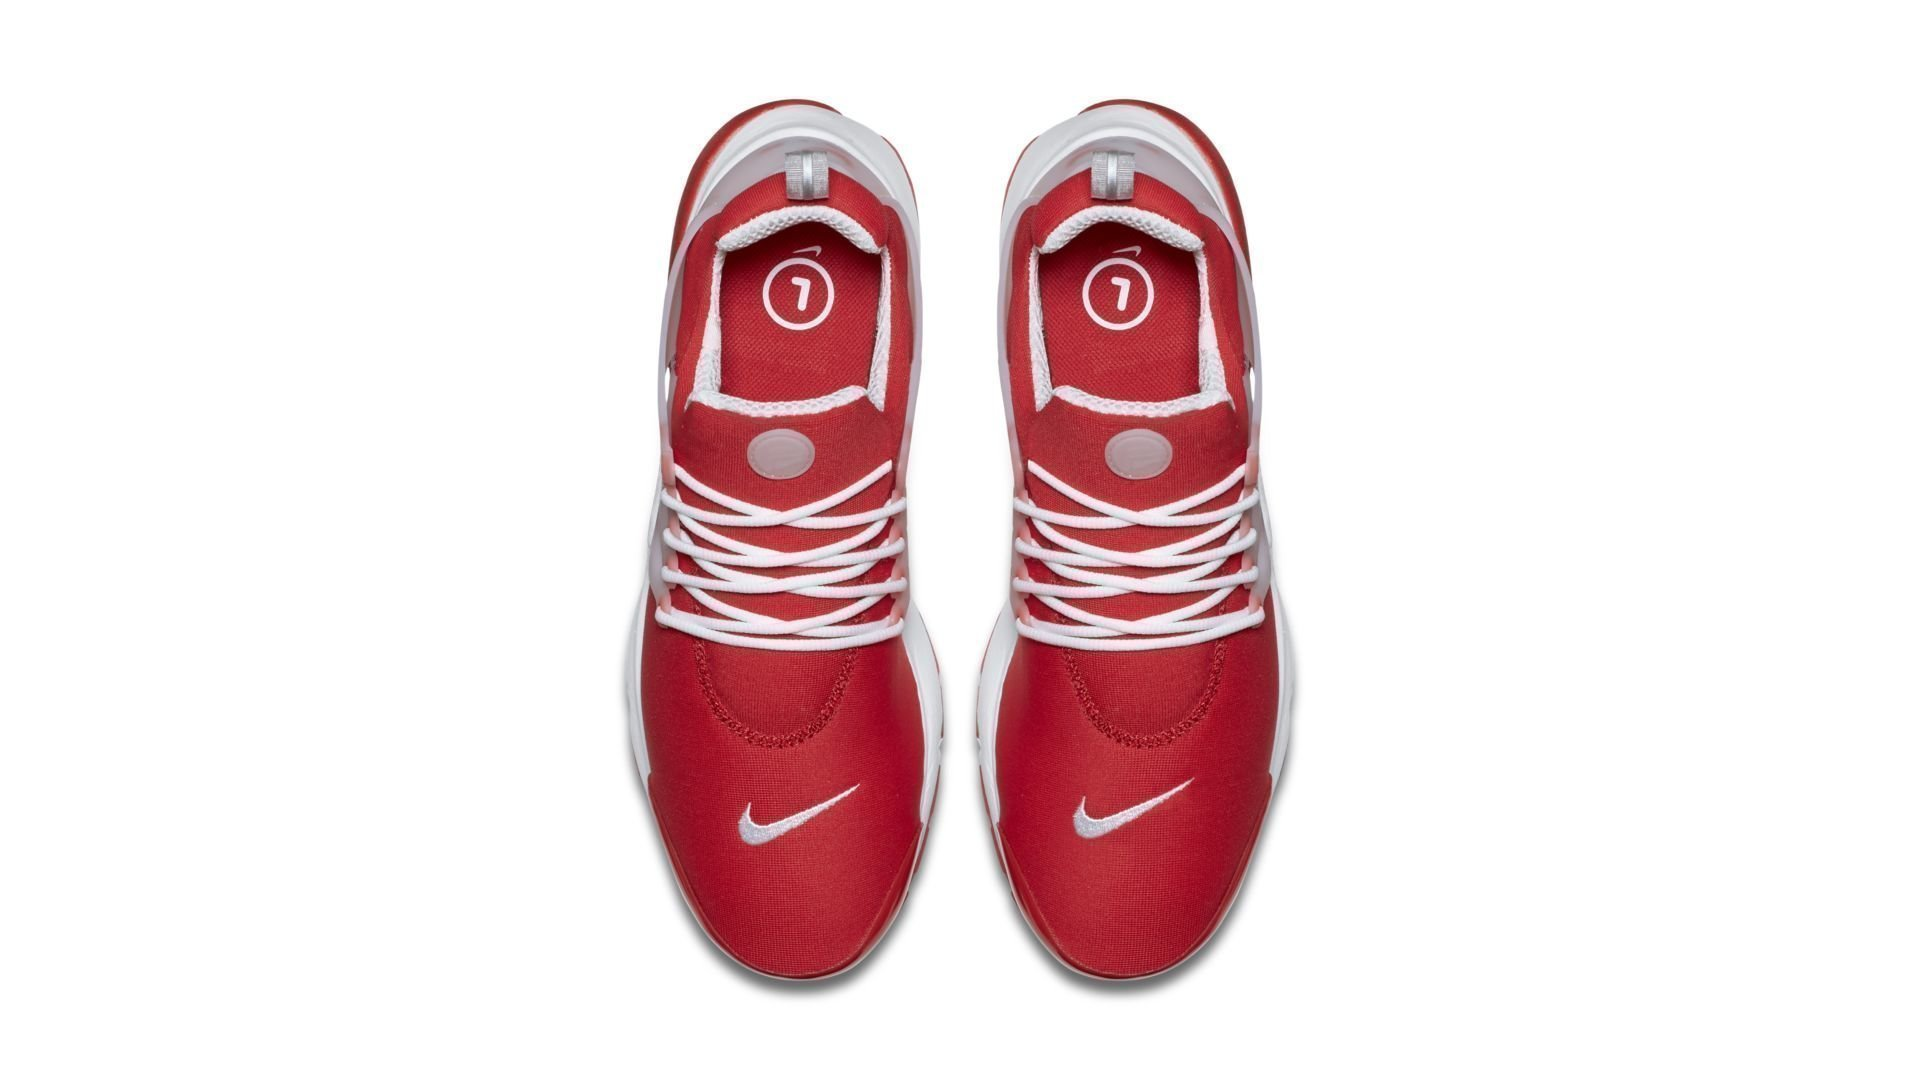 Nike Air Presto Comet Red (2015) (305919-611)